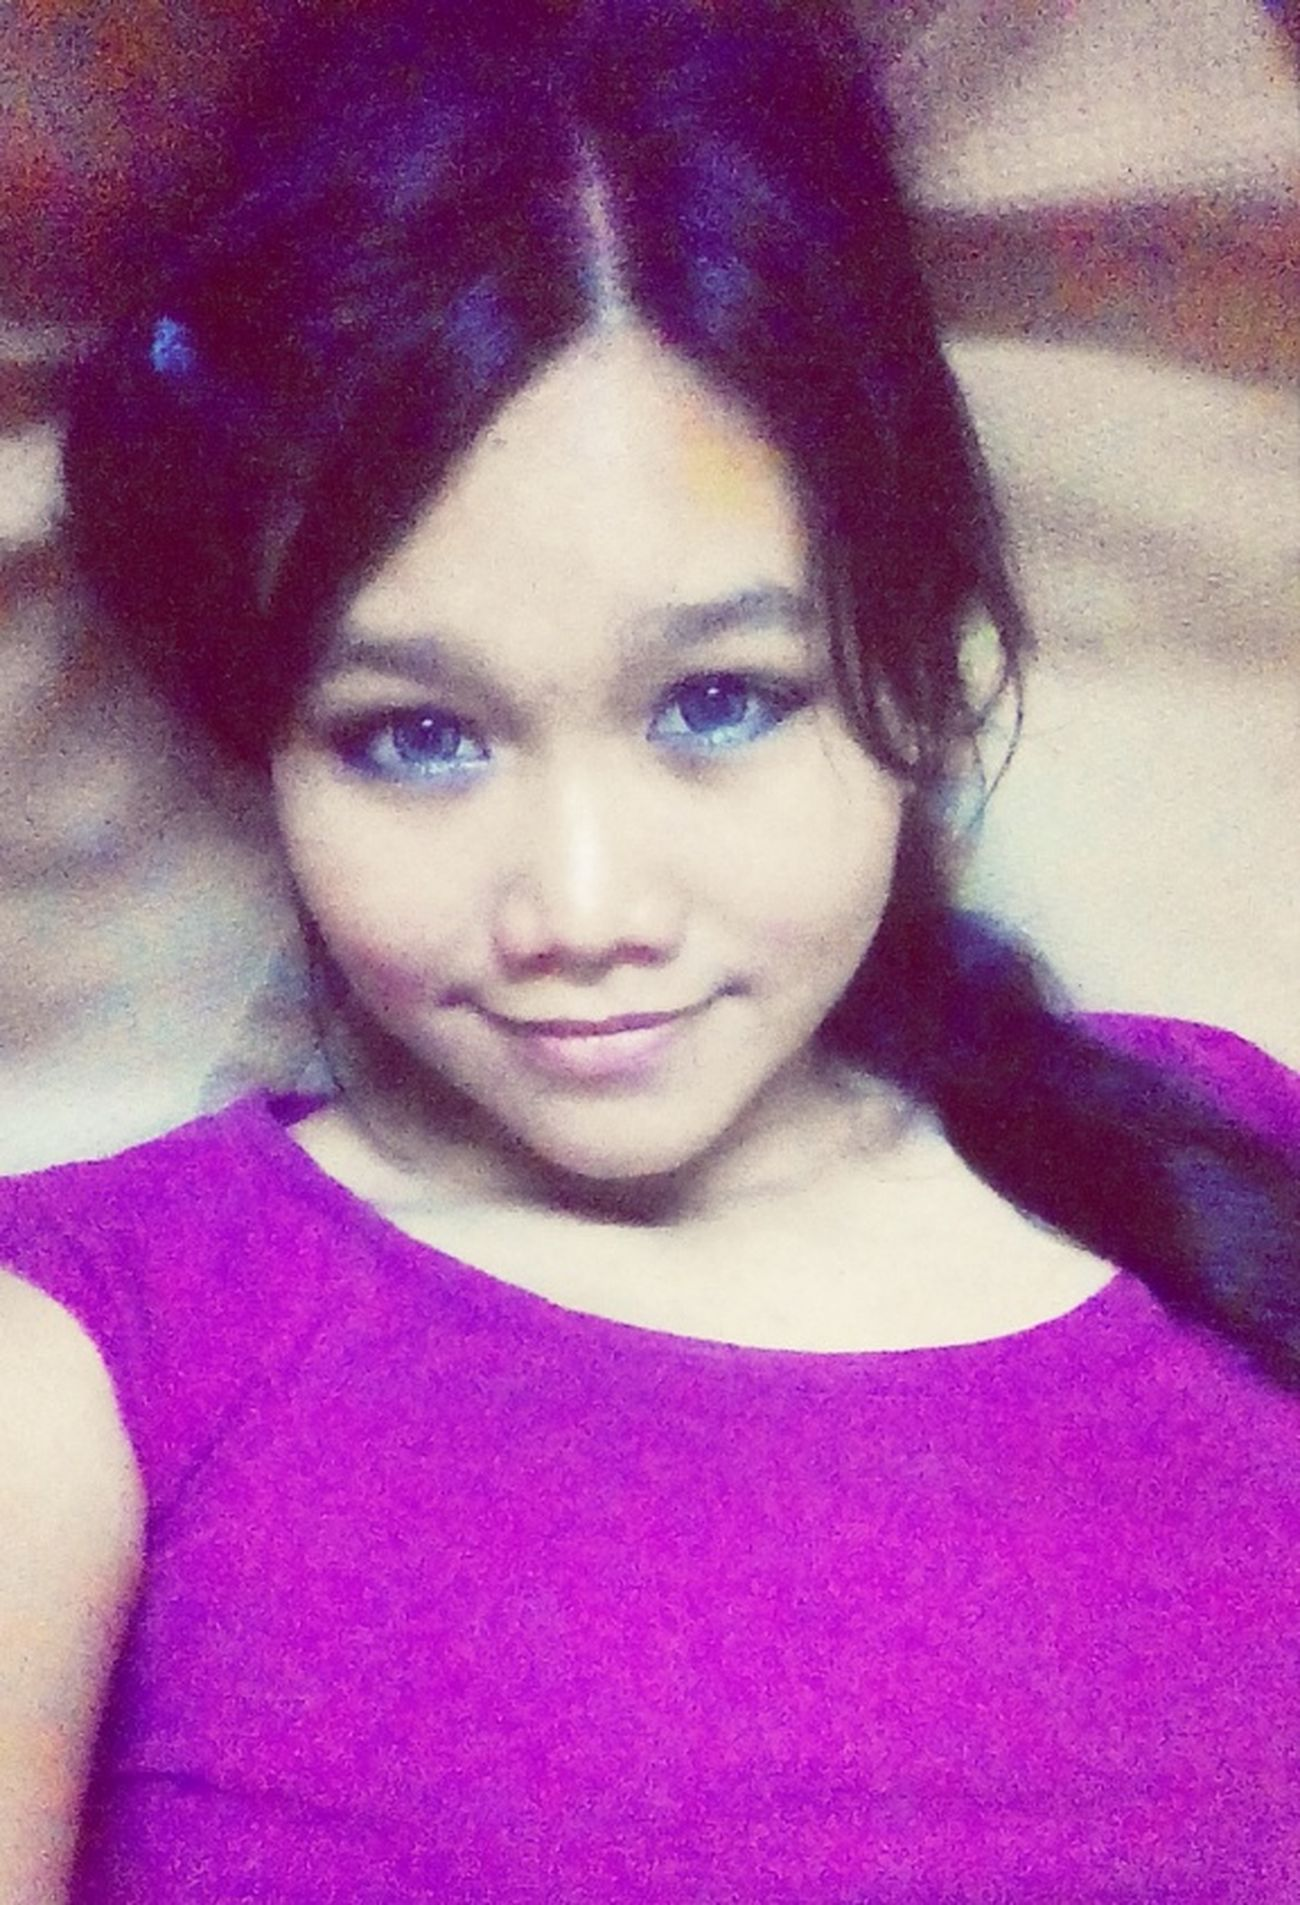 Good Night ♥ Kuala Lumpur Malayisa before sleep Selfie first .. That's Me